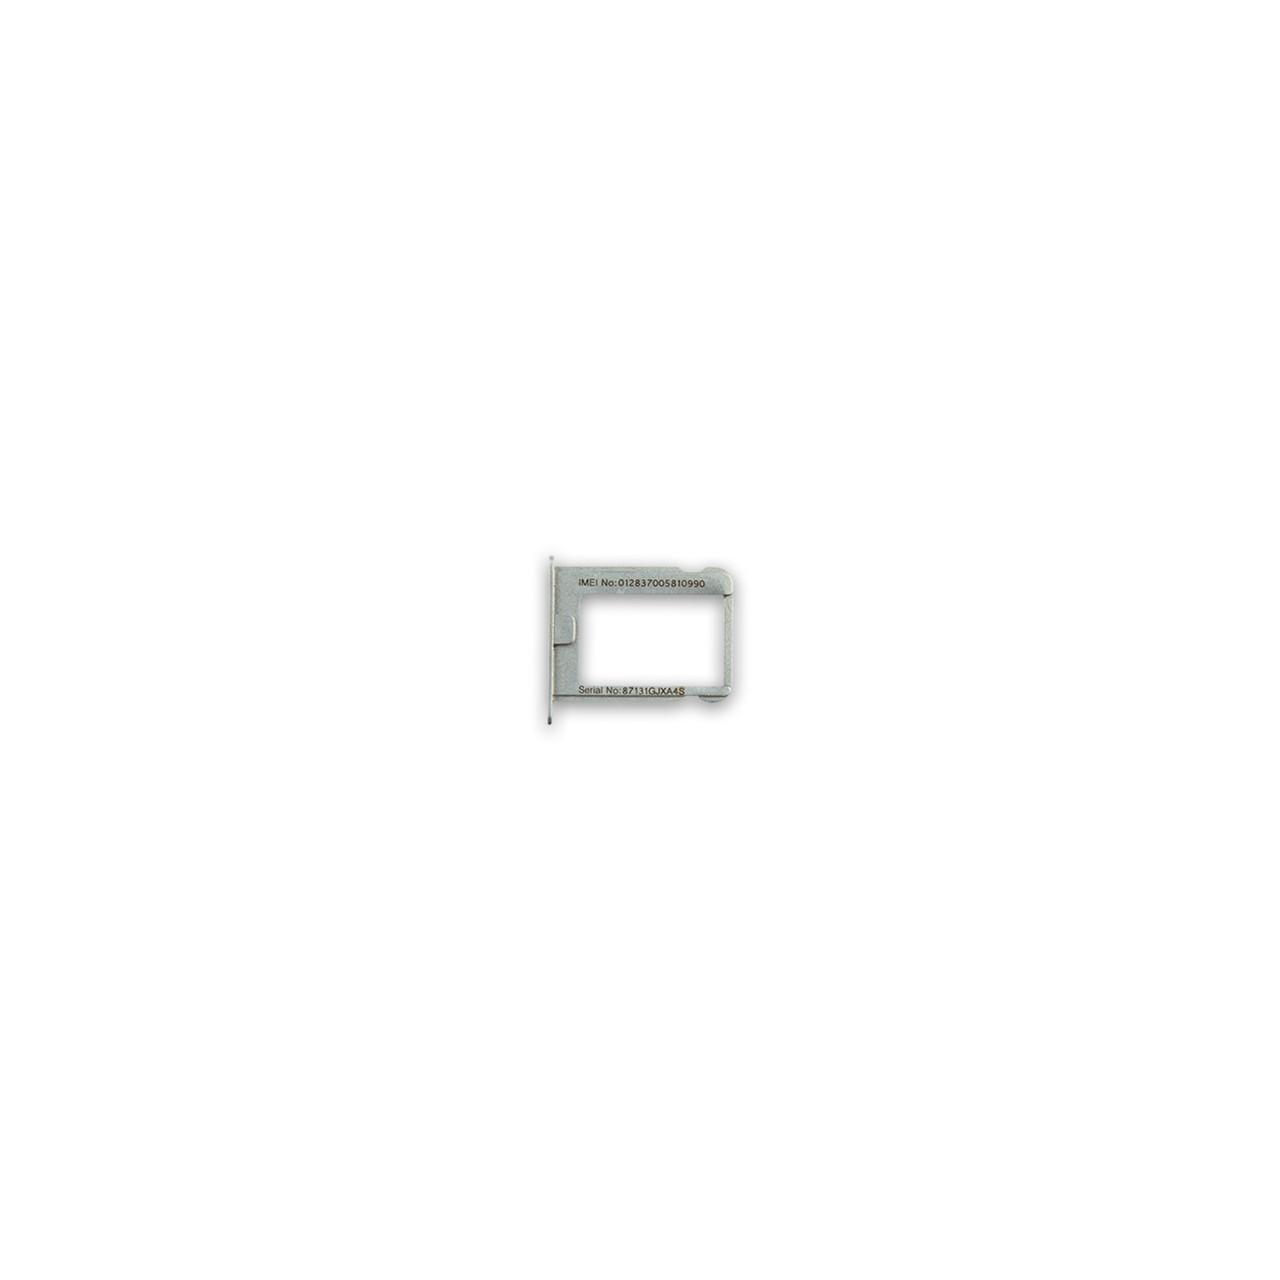 SIM-держатель APPLE iPhone 4/4S светло-серый